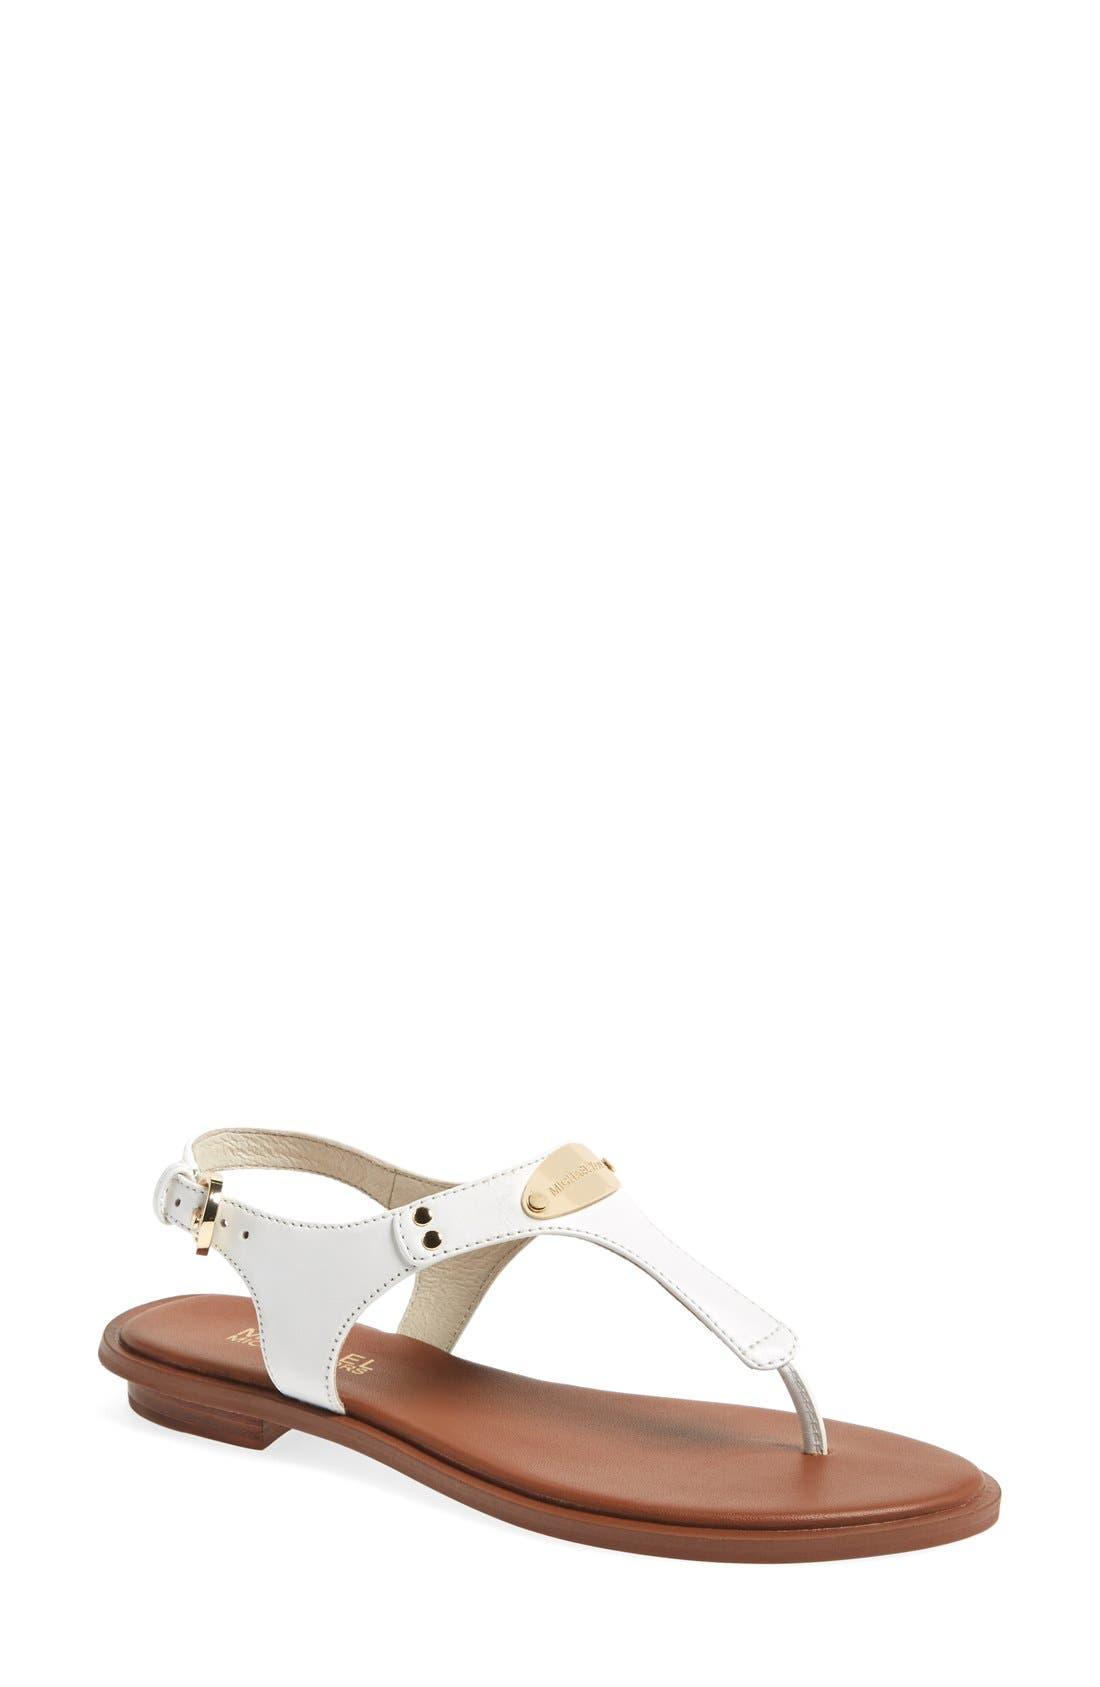 Alternate Image 1 Selected - MICHAEL Michael Kors 'Plate' Thong Sandal